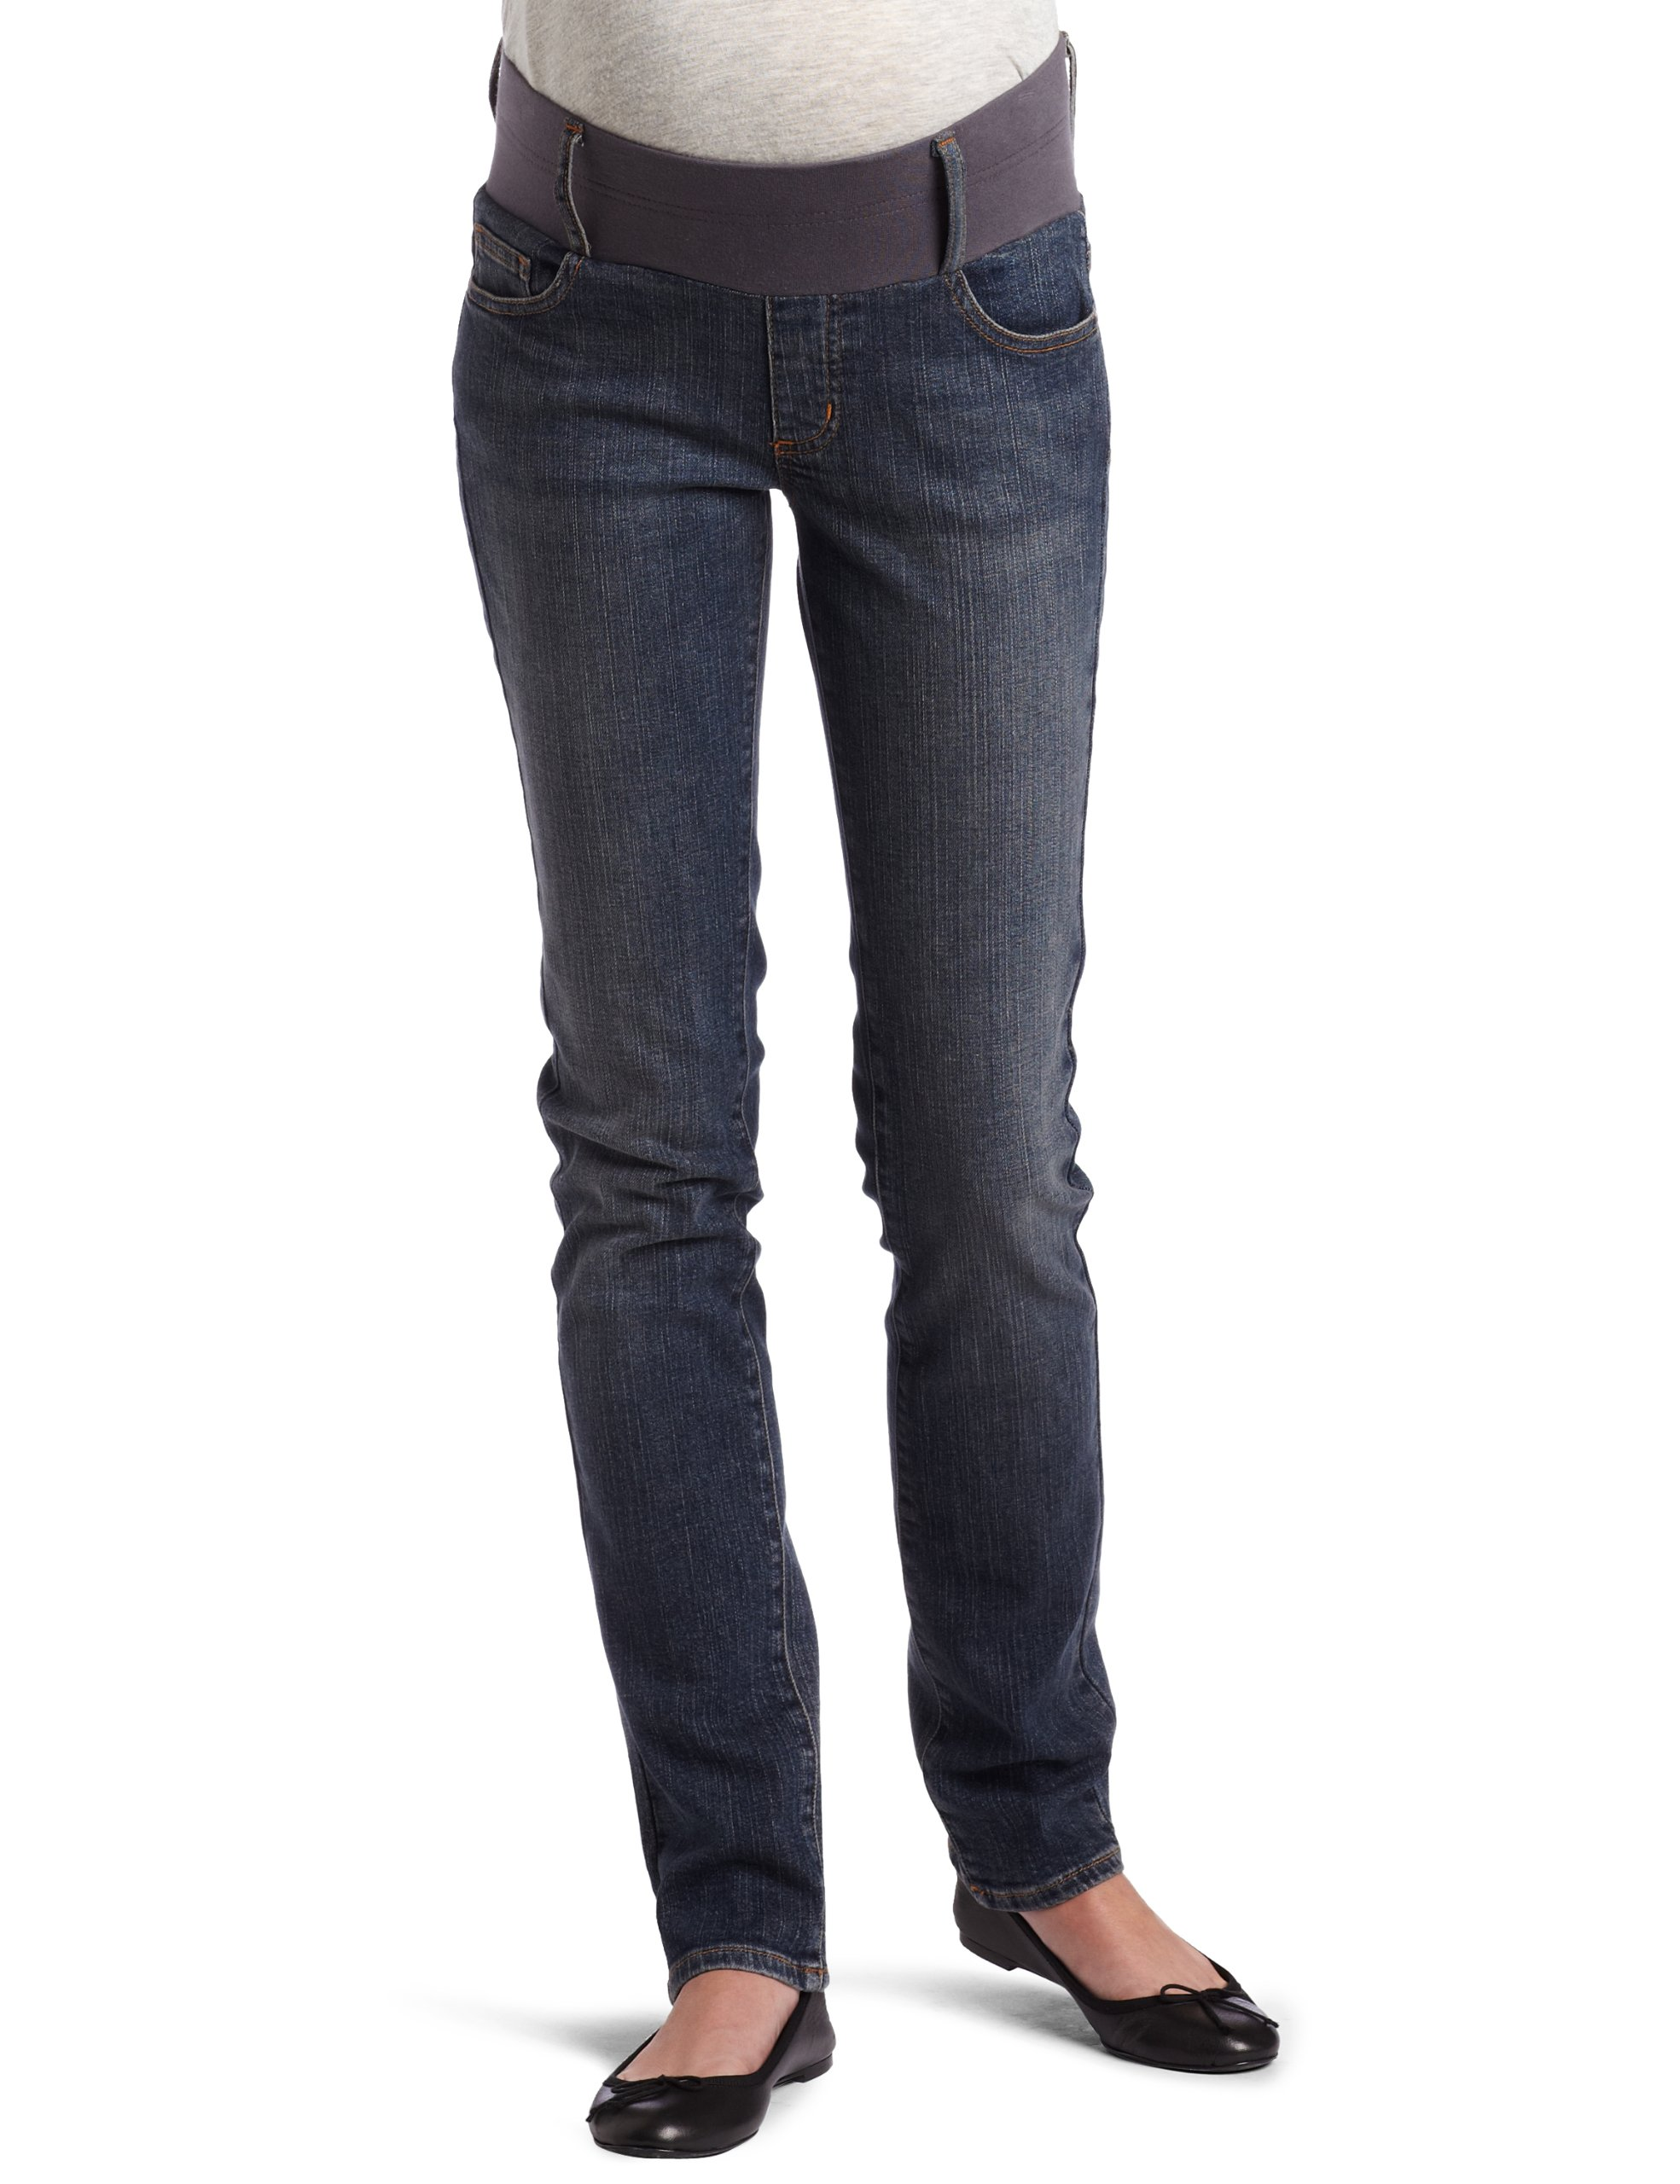 Maternal America Women's Maternity California Skinny Jeans, Dark Wash, Large